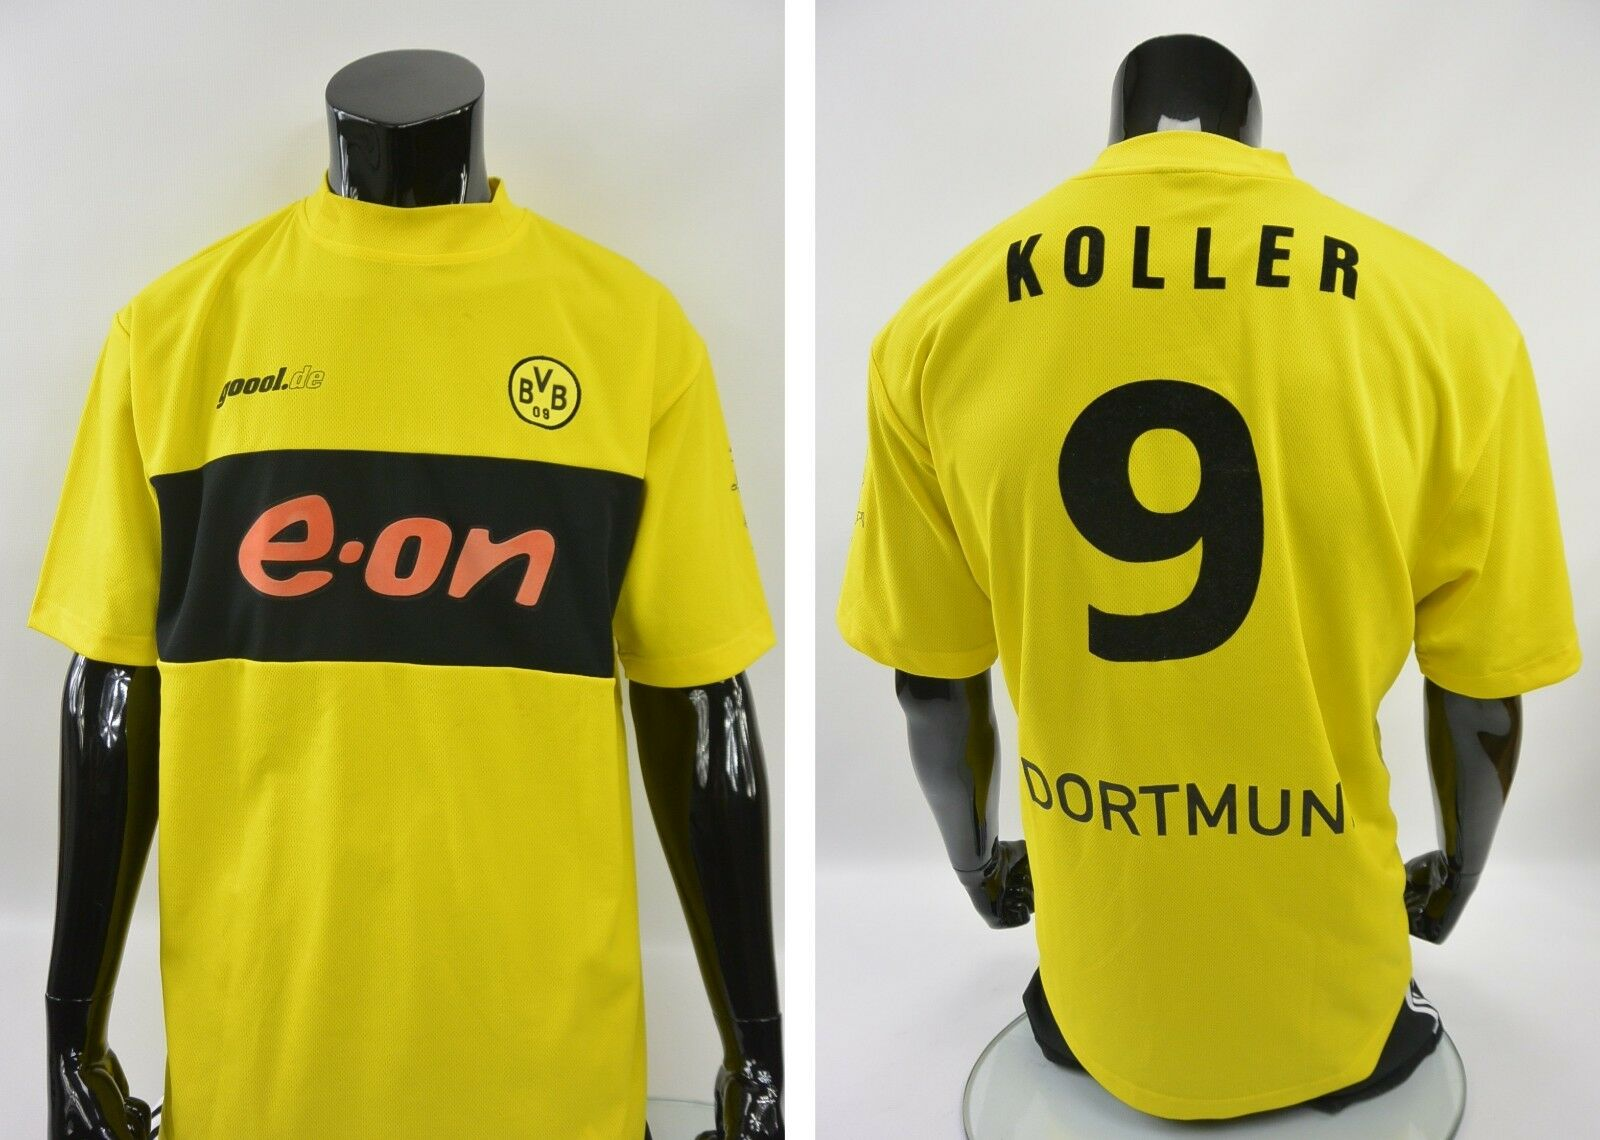 2002-2003 GOOOL BVB Borussia Dortmund Dortmund Borussia Home Shirt KOLLER no.9 SIZE 2XL XXL adult 2f1a0d